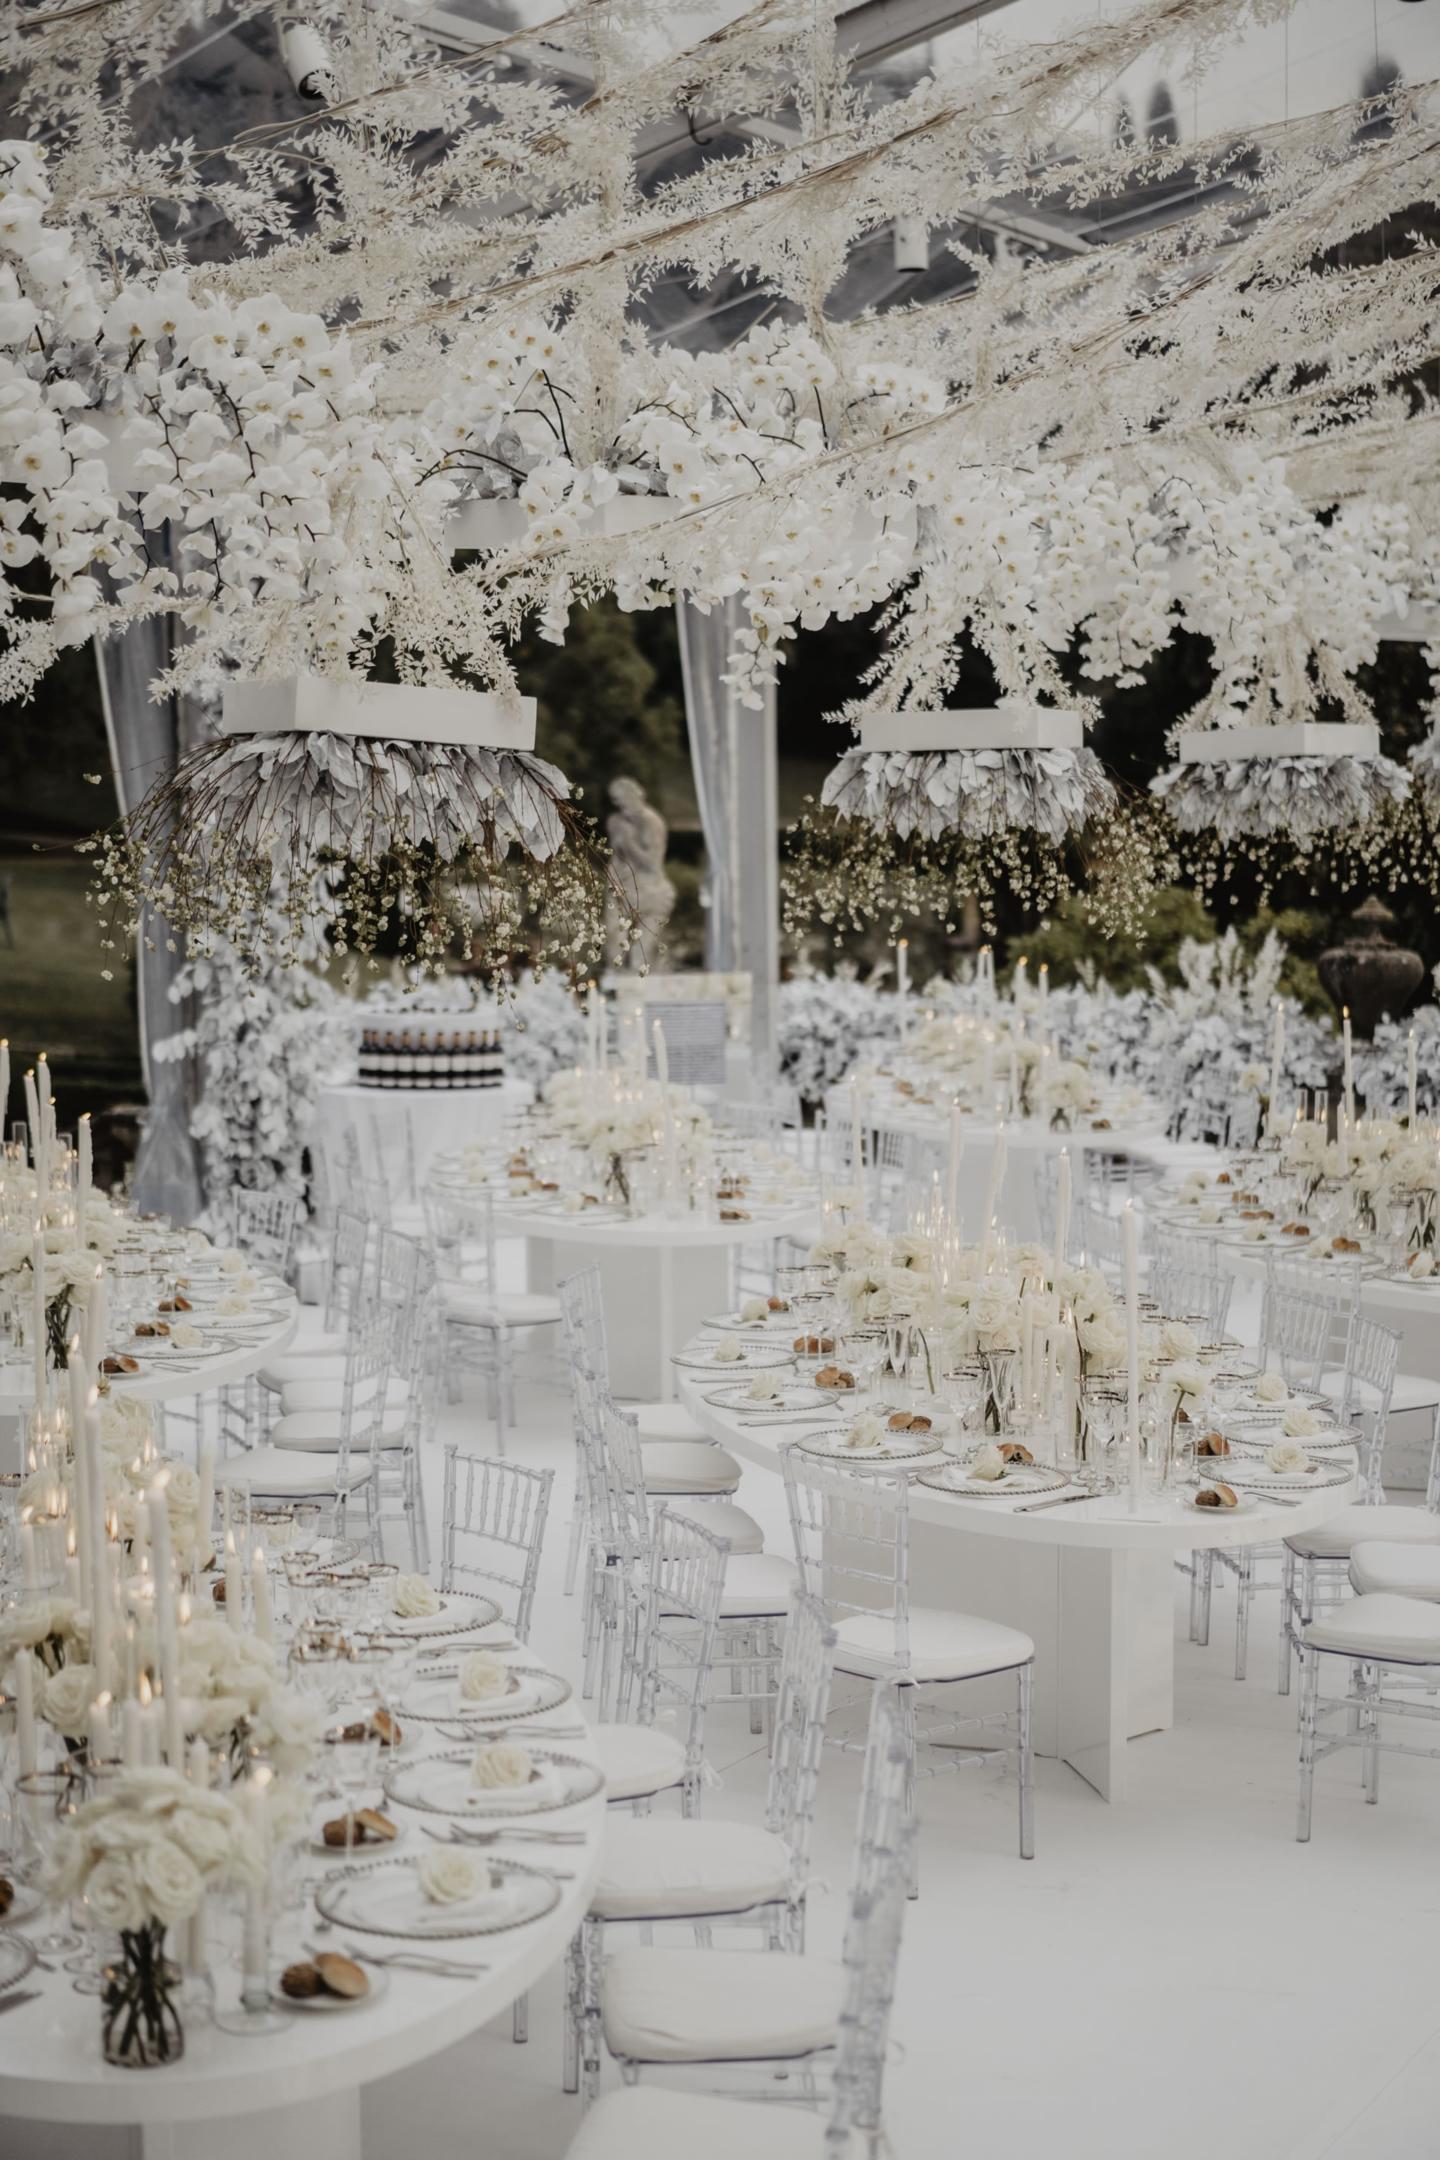 A sparkling wedding in the shore of the Arno - 73 :: A sparkling wedding on the shore of the Arno :: Luxury wedding photography - 72 :: A sparkling wedding in the shore of the Arno - 73